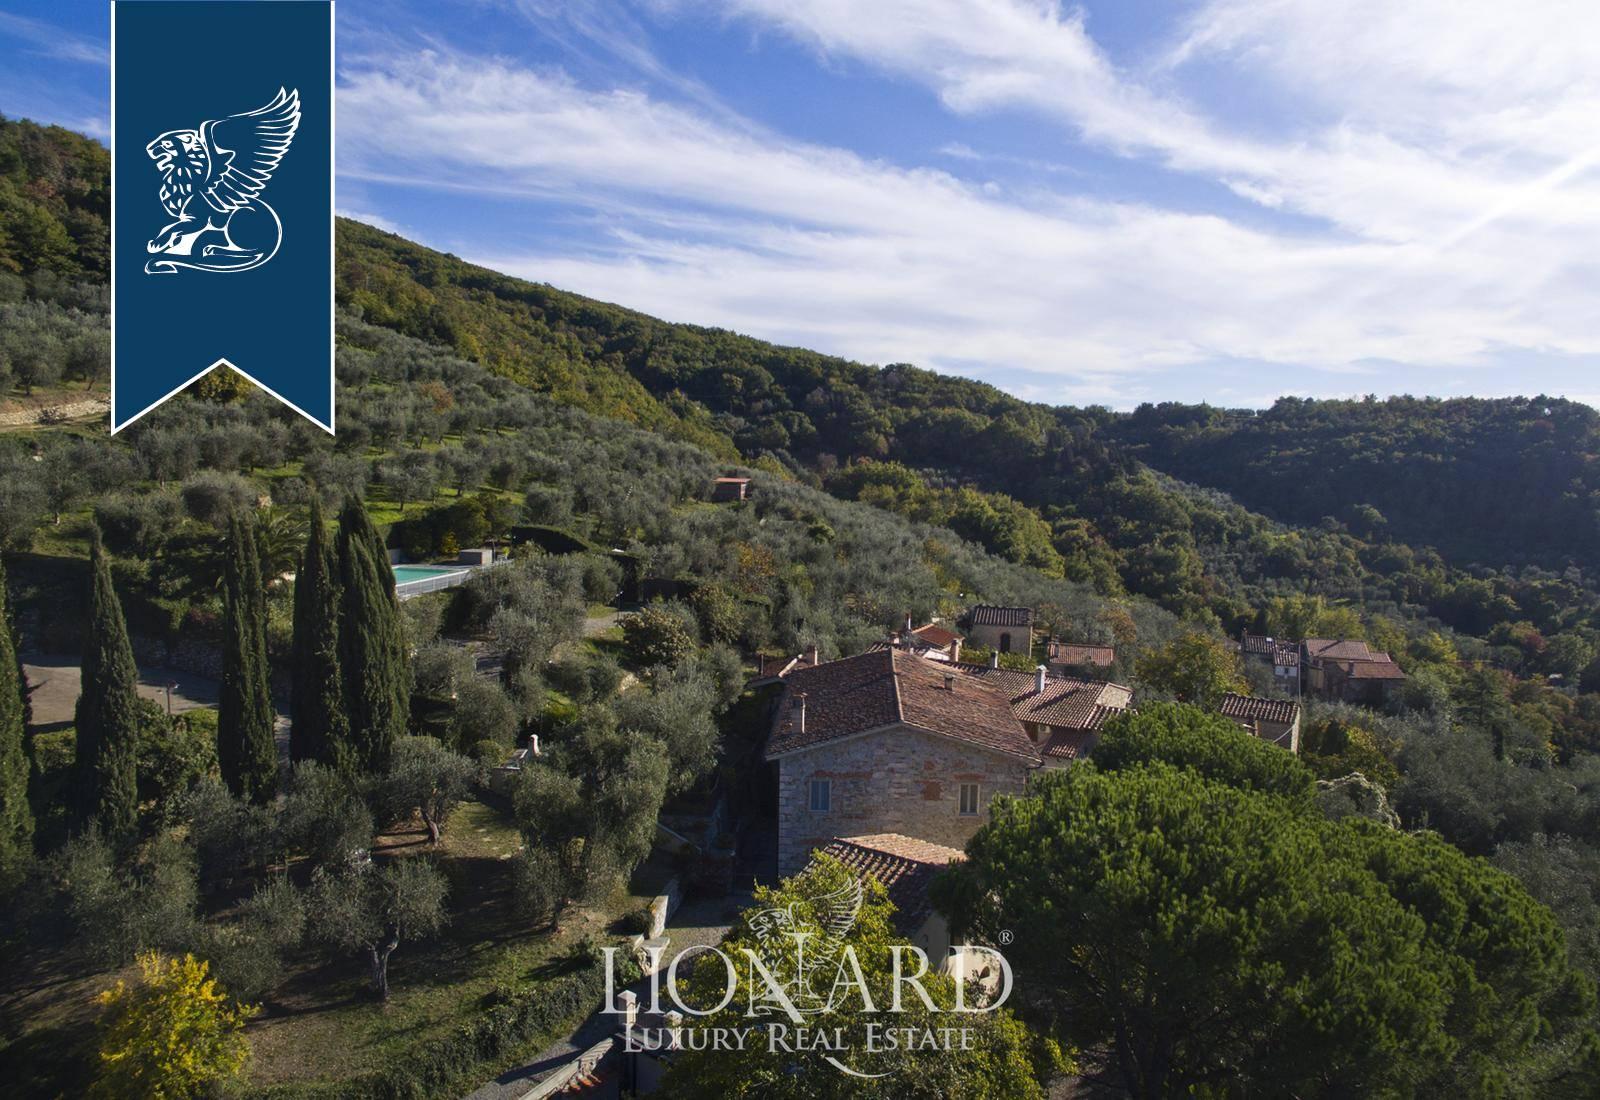 Agriturismo in Vendita a Monsummano Terme: 0 locali, 700 mq - Foto 5